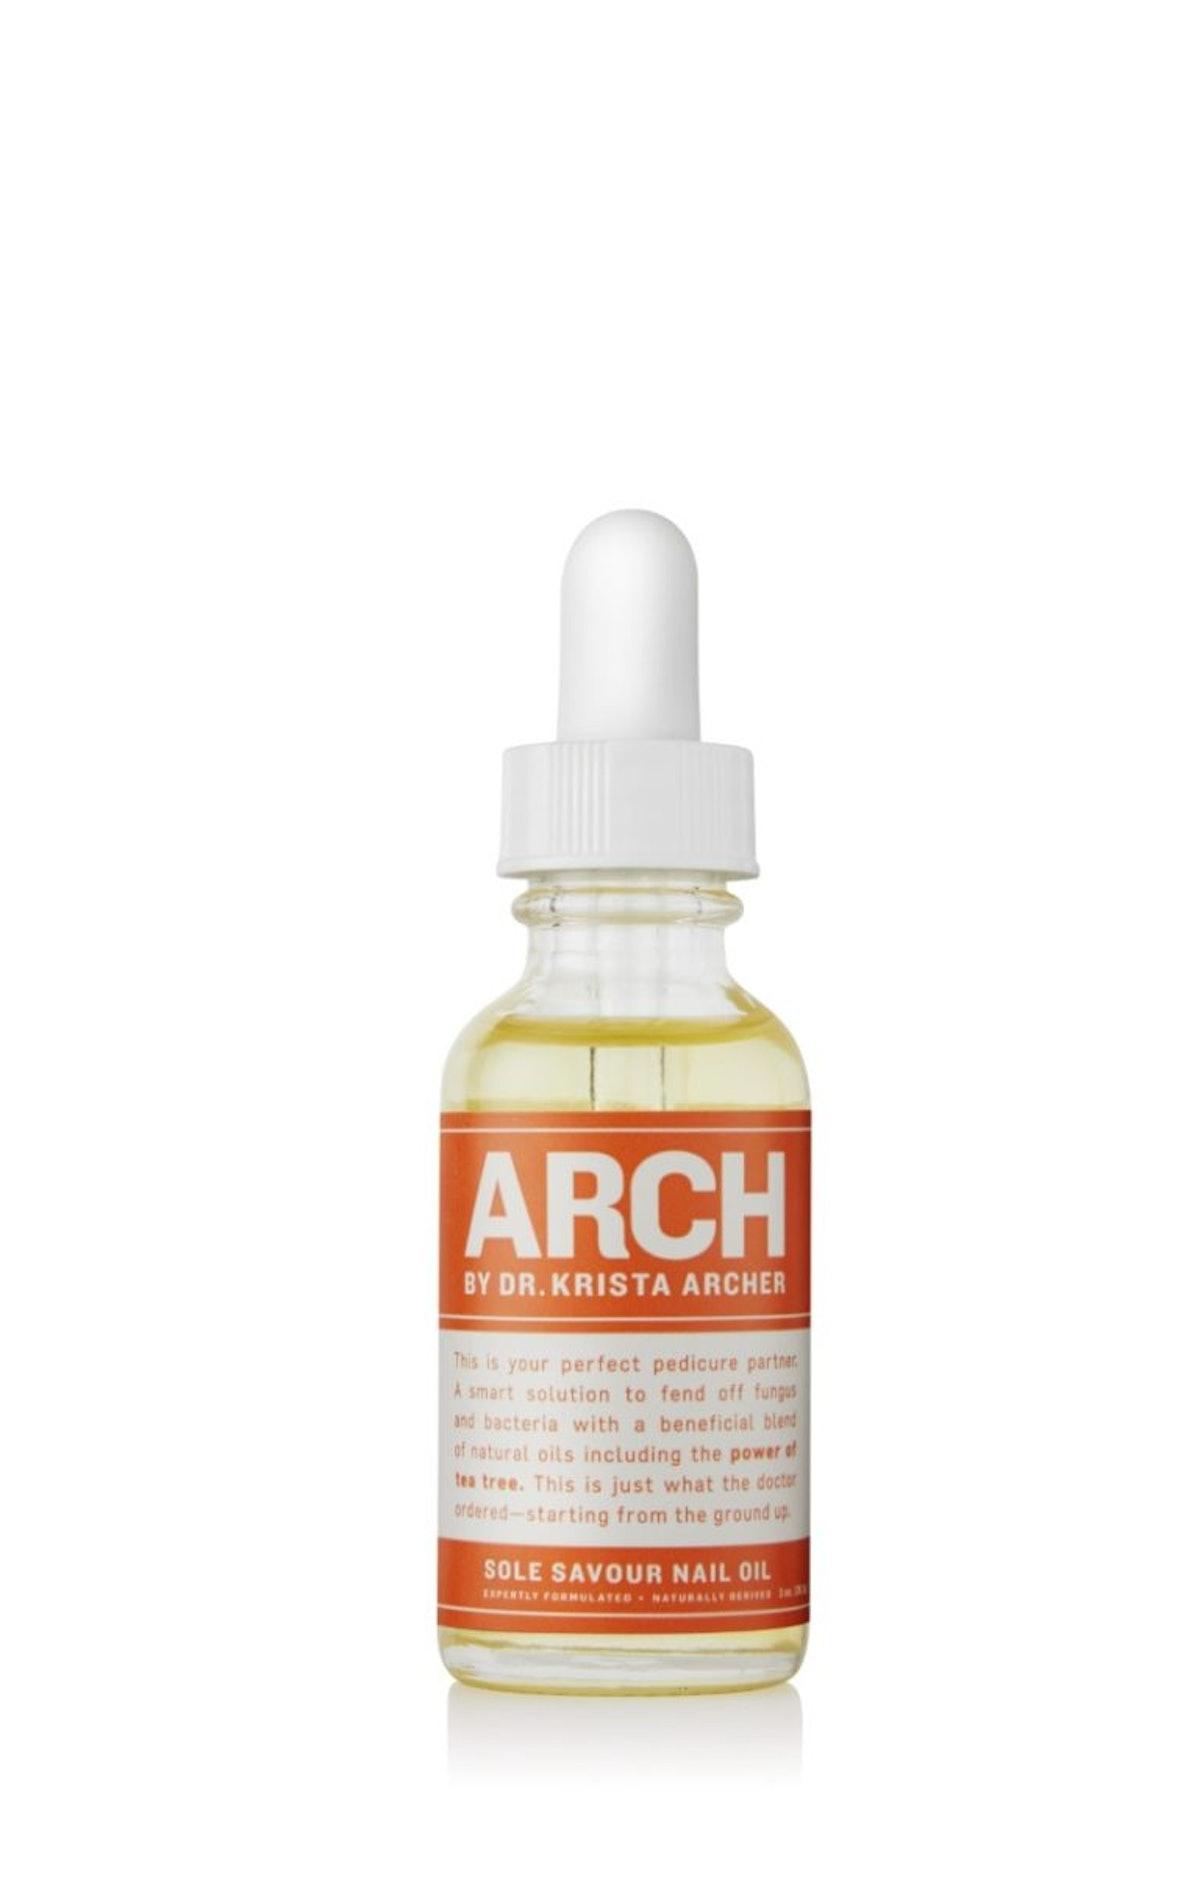 ARCH Sole Savour Nail Oil